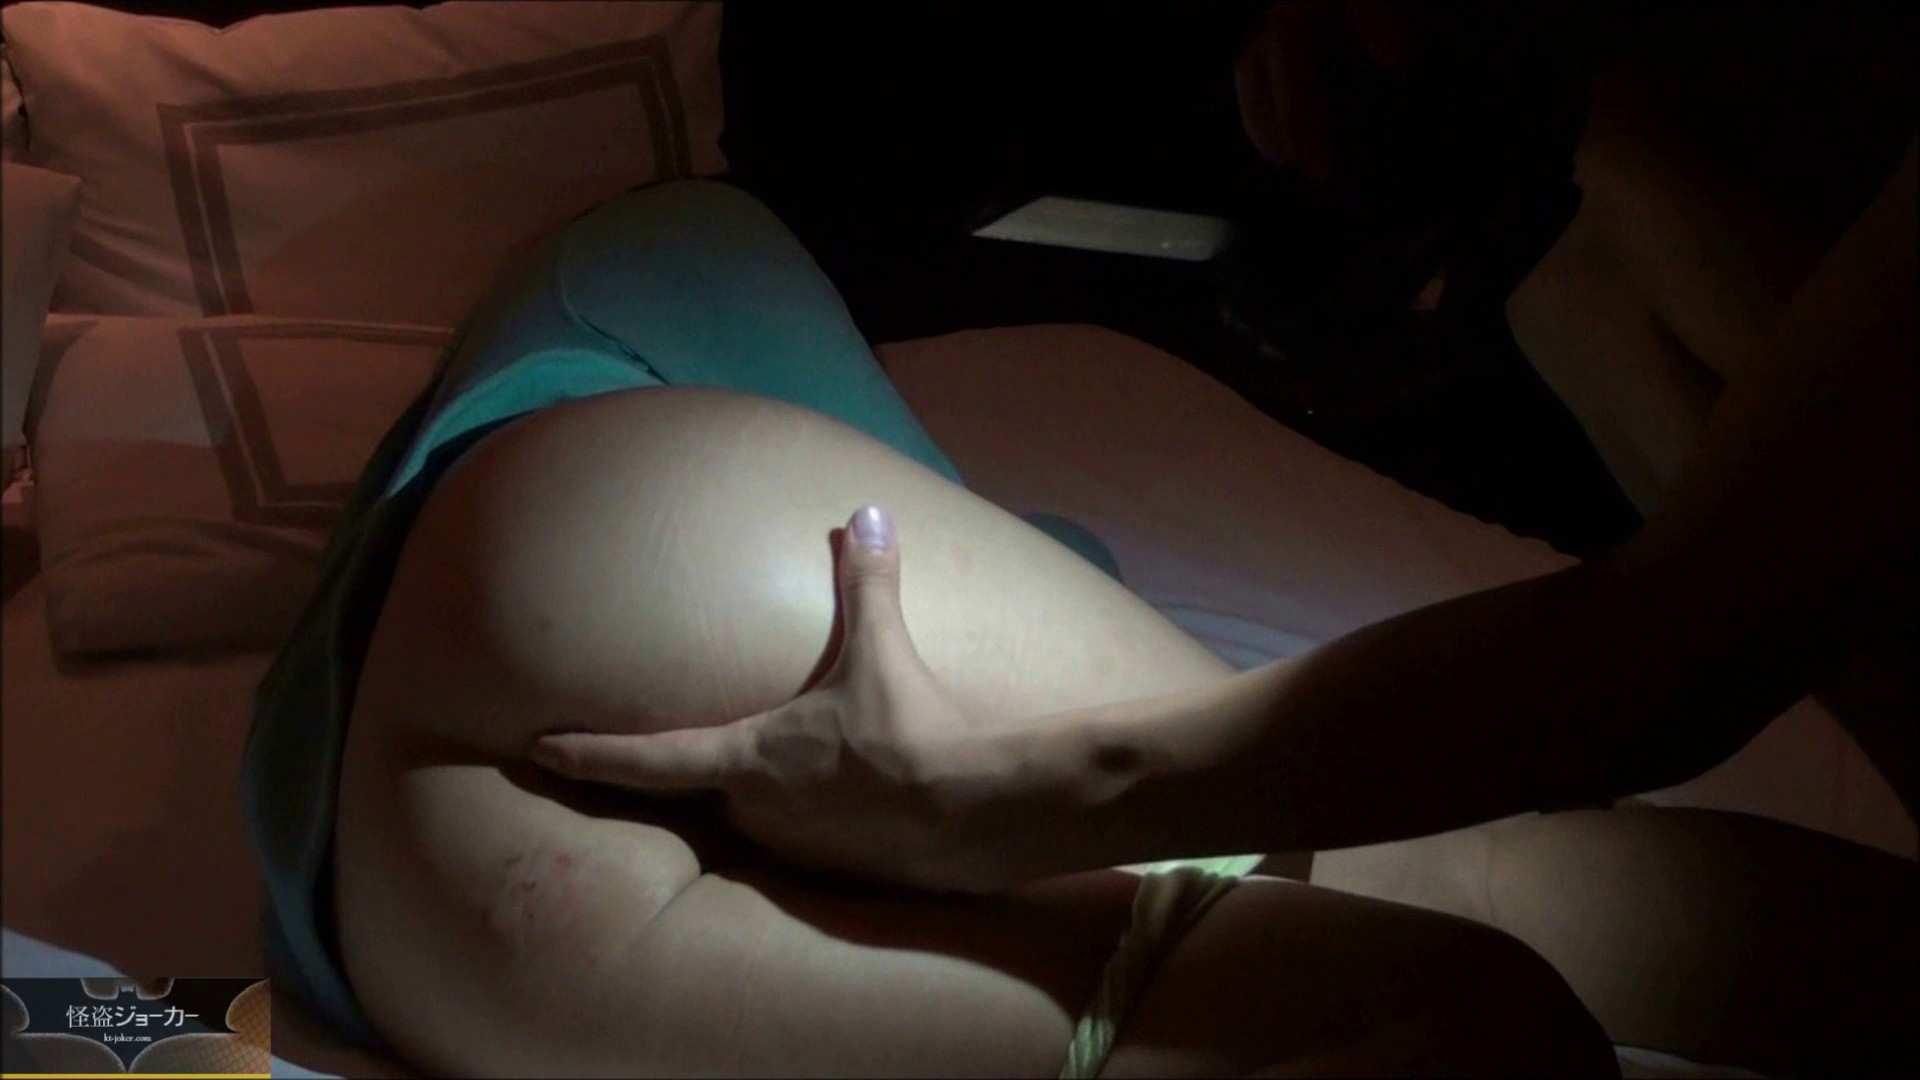 vol.76 {天然系☆若い娘}yuiちゃん_コスプレ撮影と騙してホテルで… フェラ・シーン 戯れ無修正画像 99枚 19